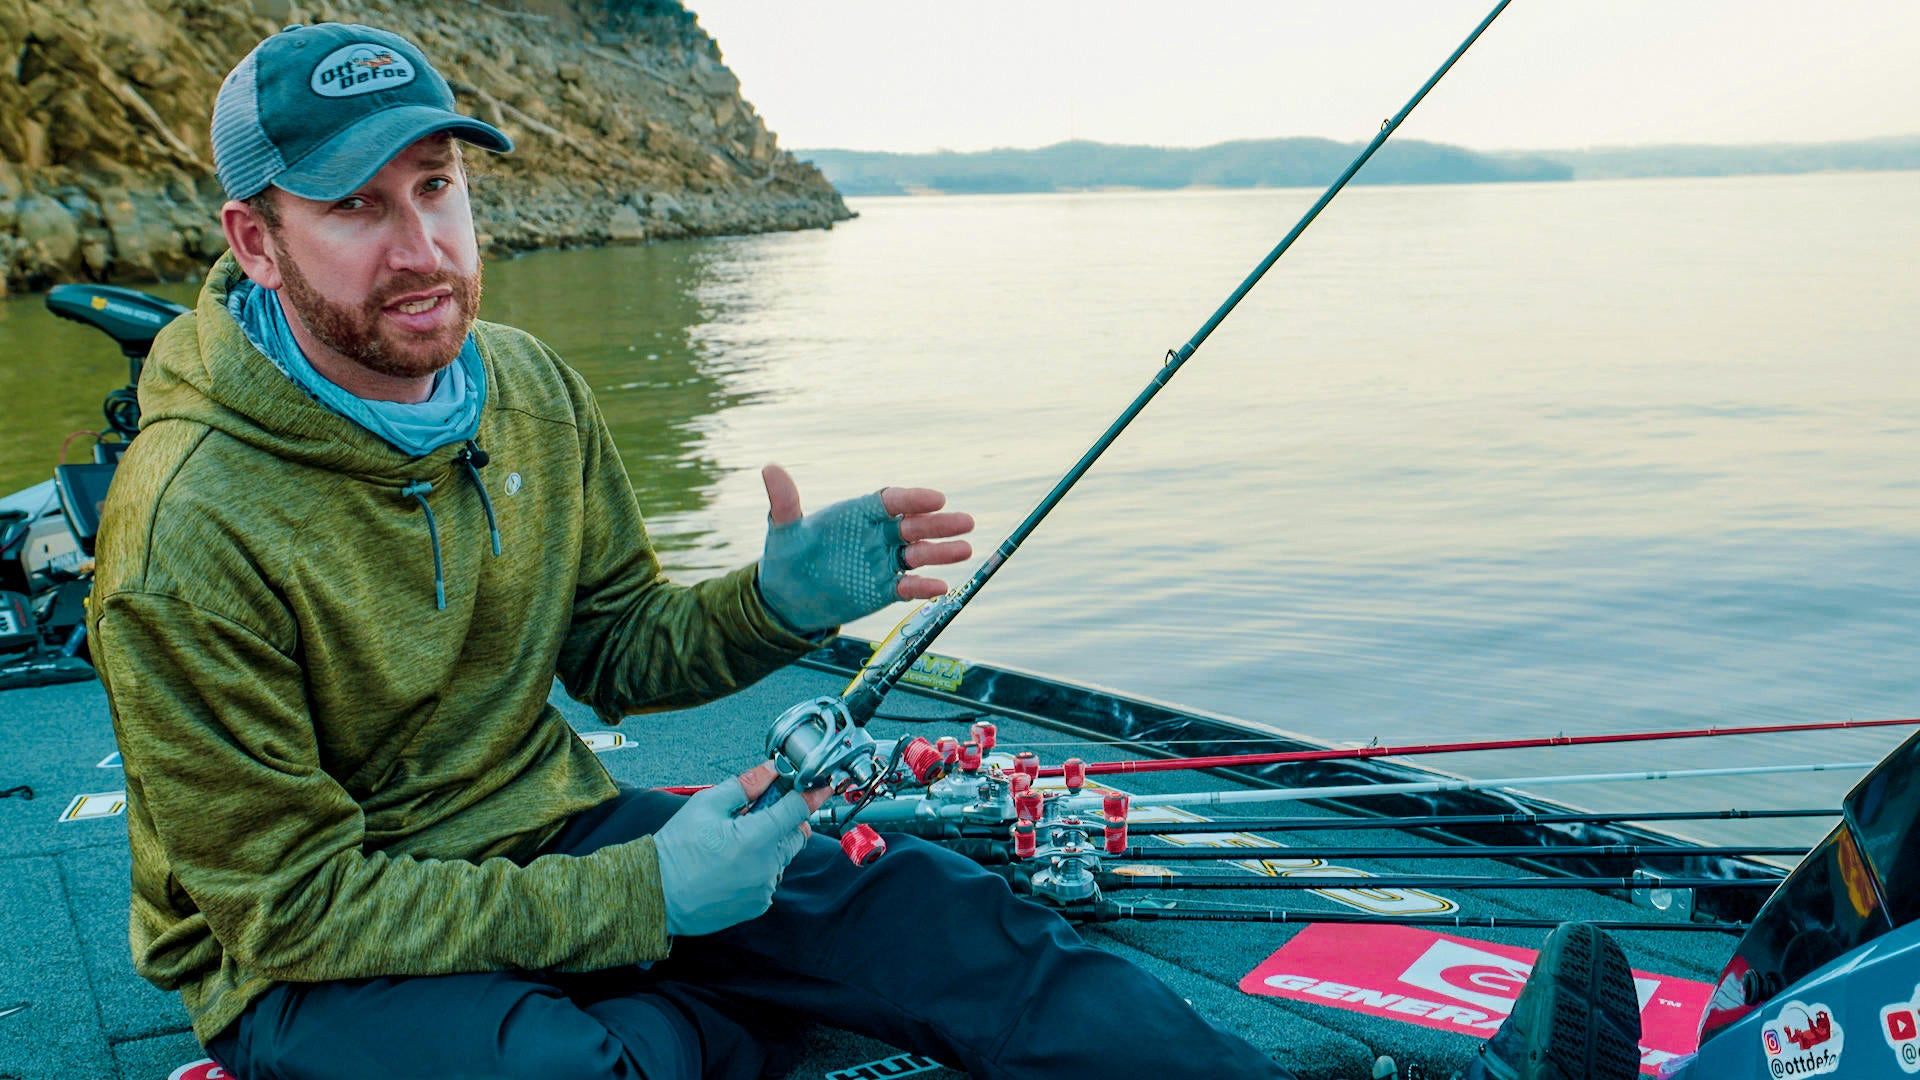 Ott DeFoe's 5 Go-to Lures for Spring Bass Fishing